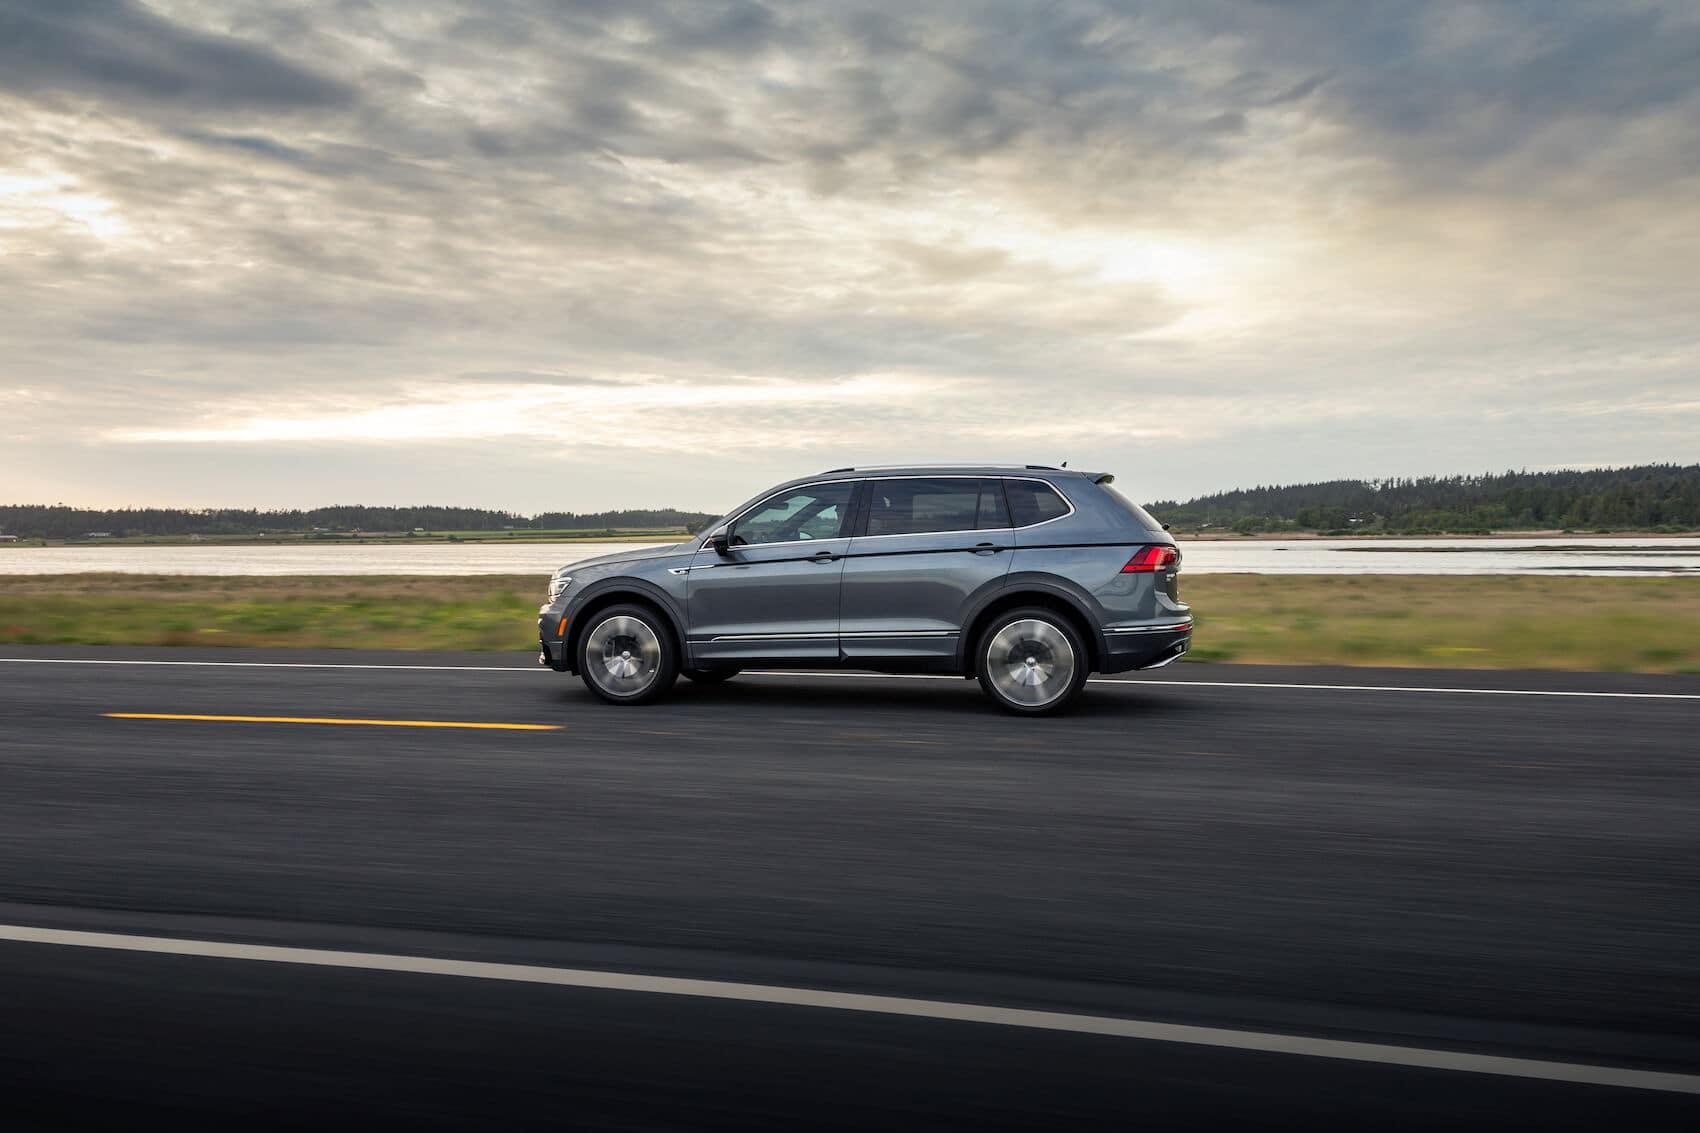 2020 VW Tiguan vs Nissan Rogue McDonald VW Littleton, CO